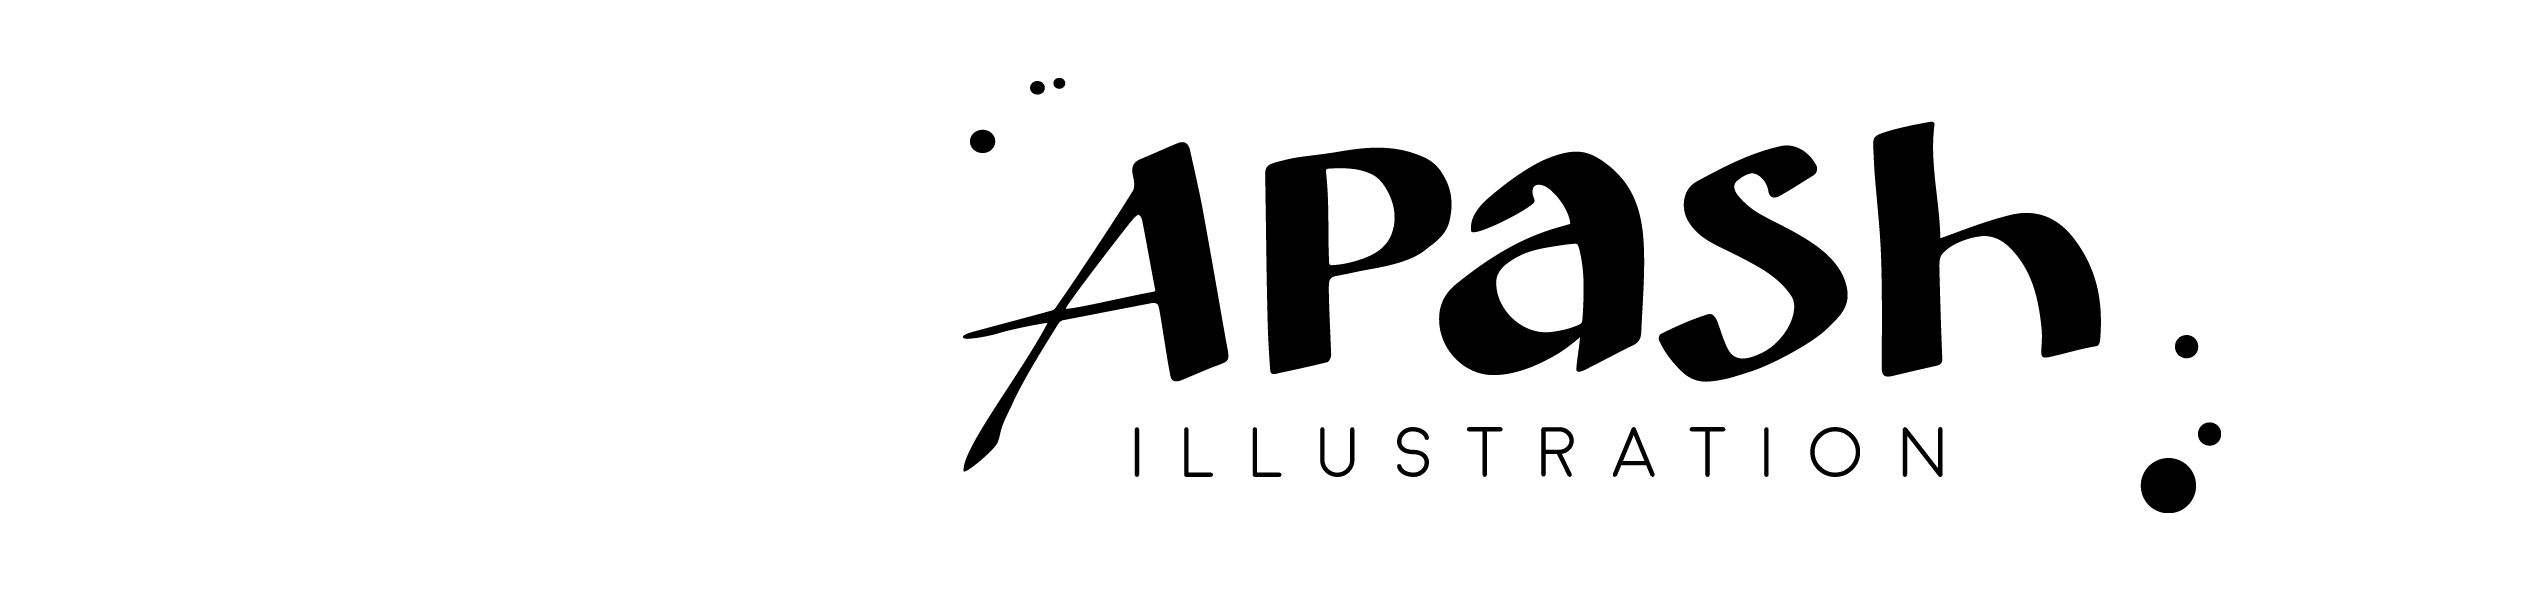 APASH illustration